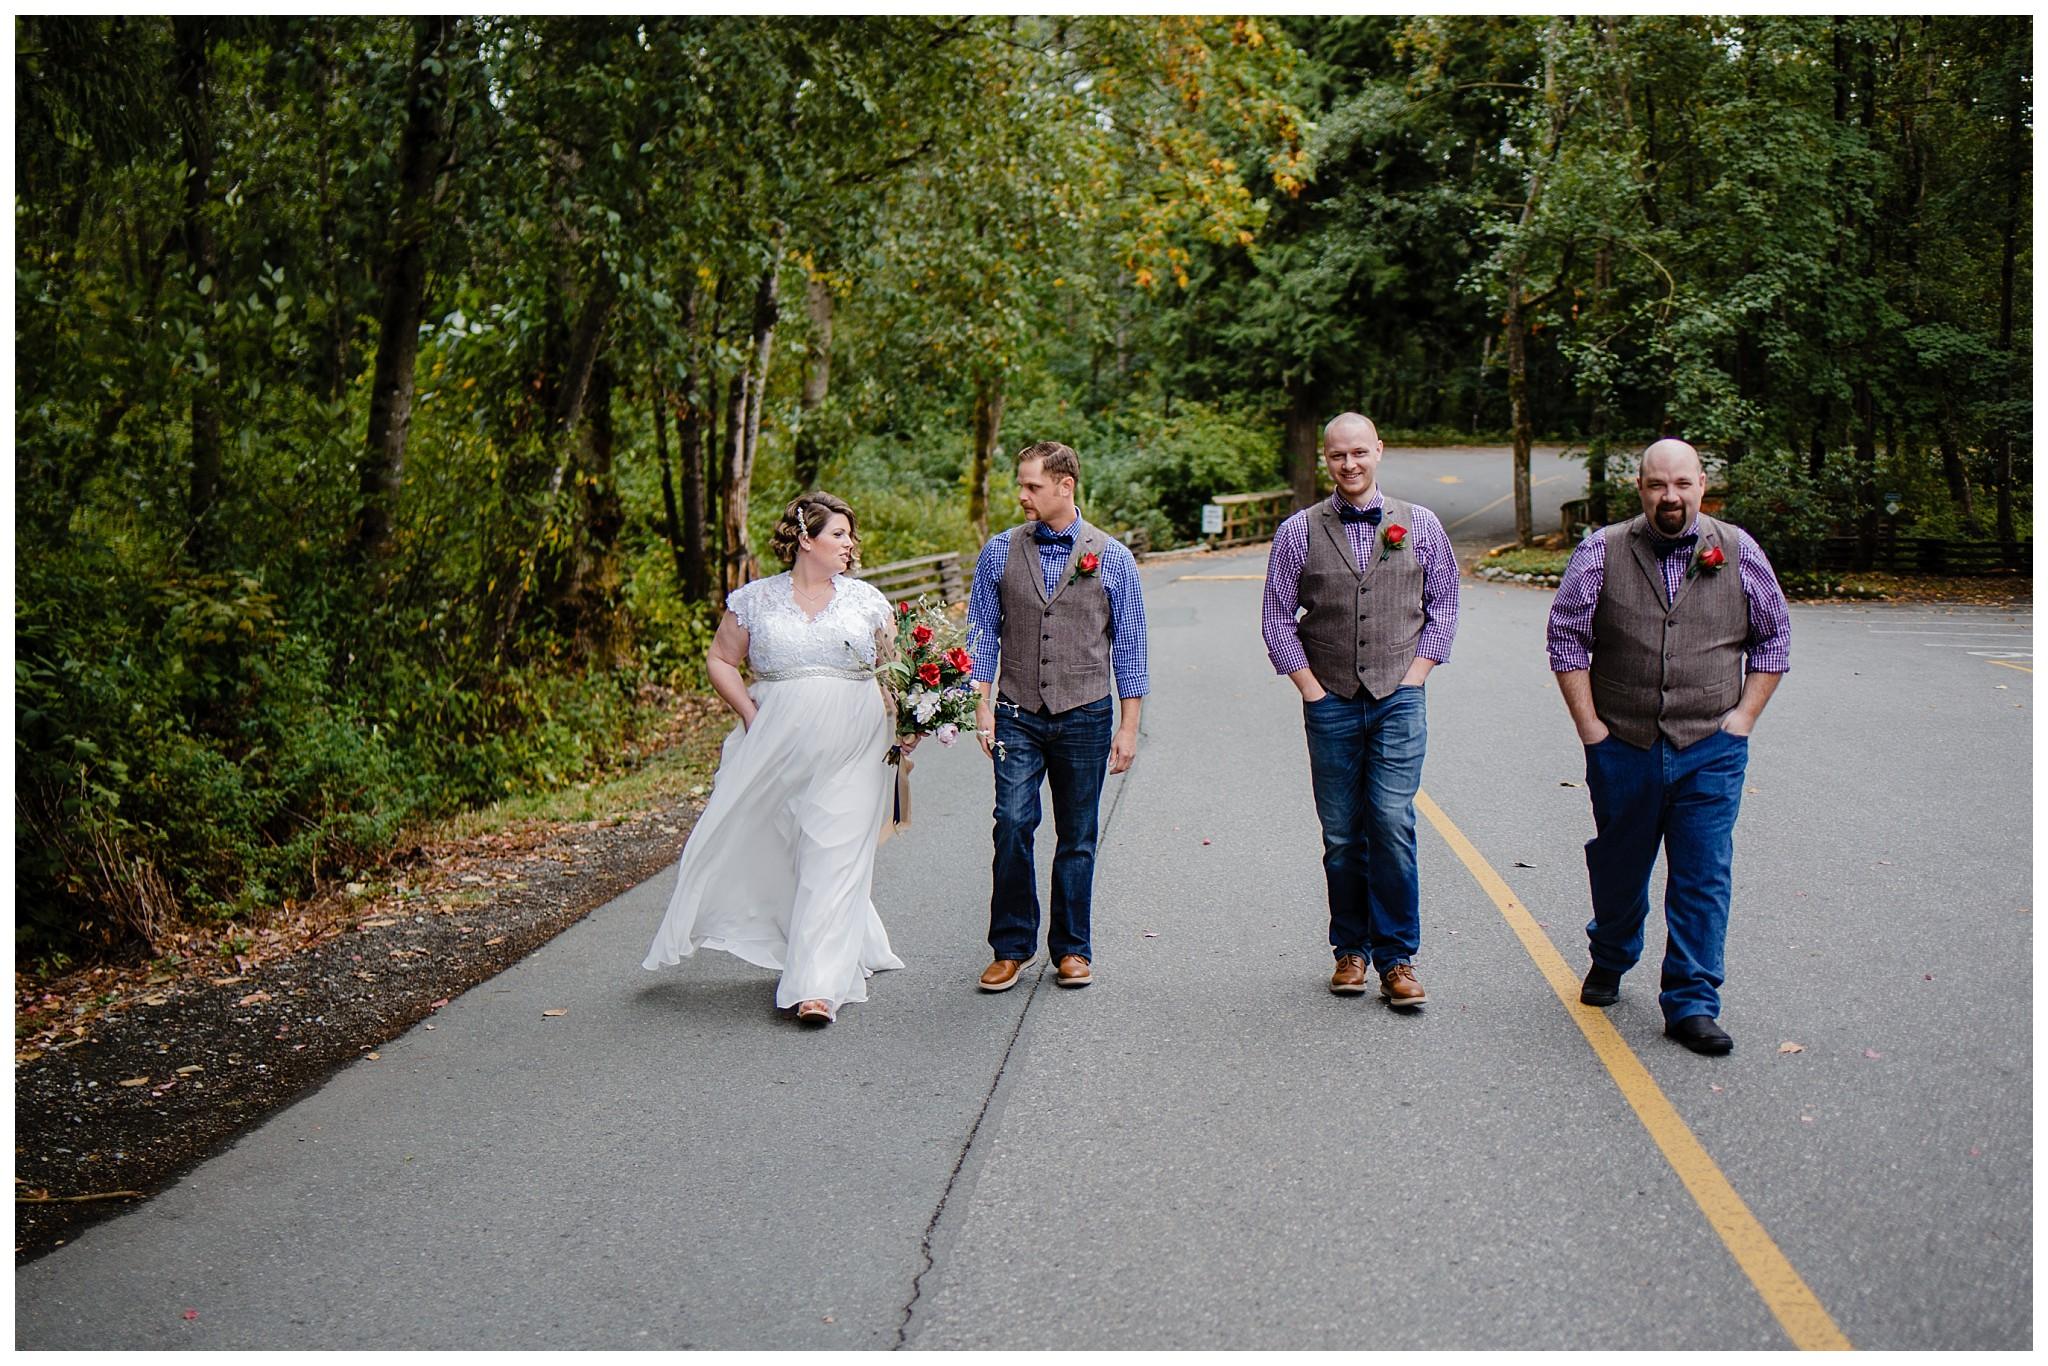 Aldergrove Park Fall Backyard Wedding Photographer Pregnant Bride Tent Outdoor BC Canada Best Wedding Photographer_0021.jpg